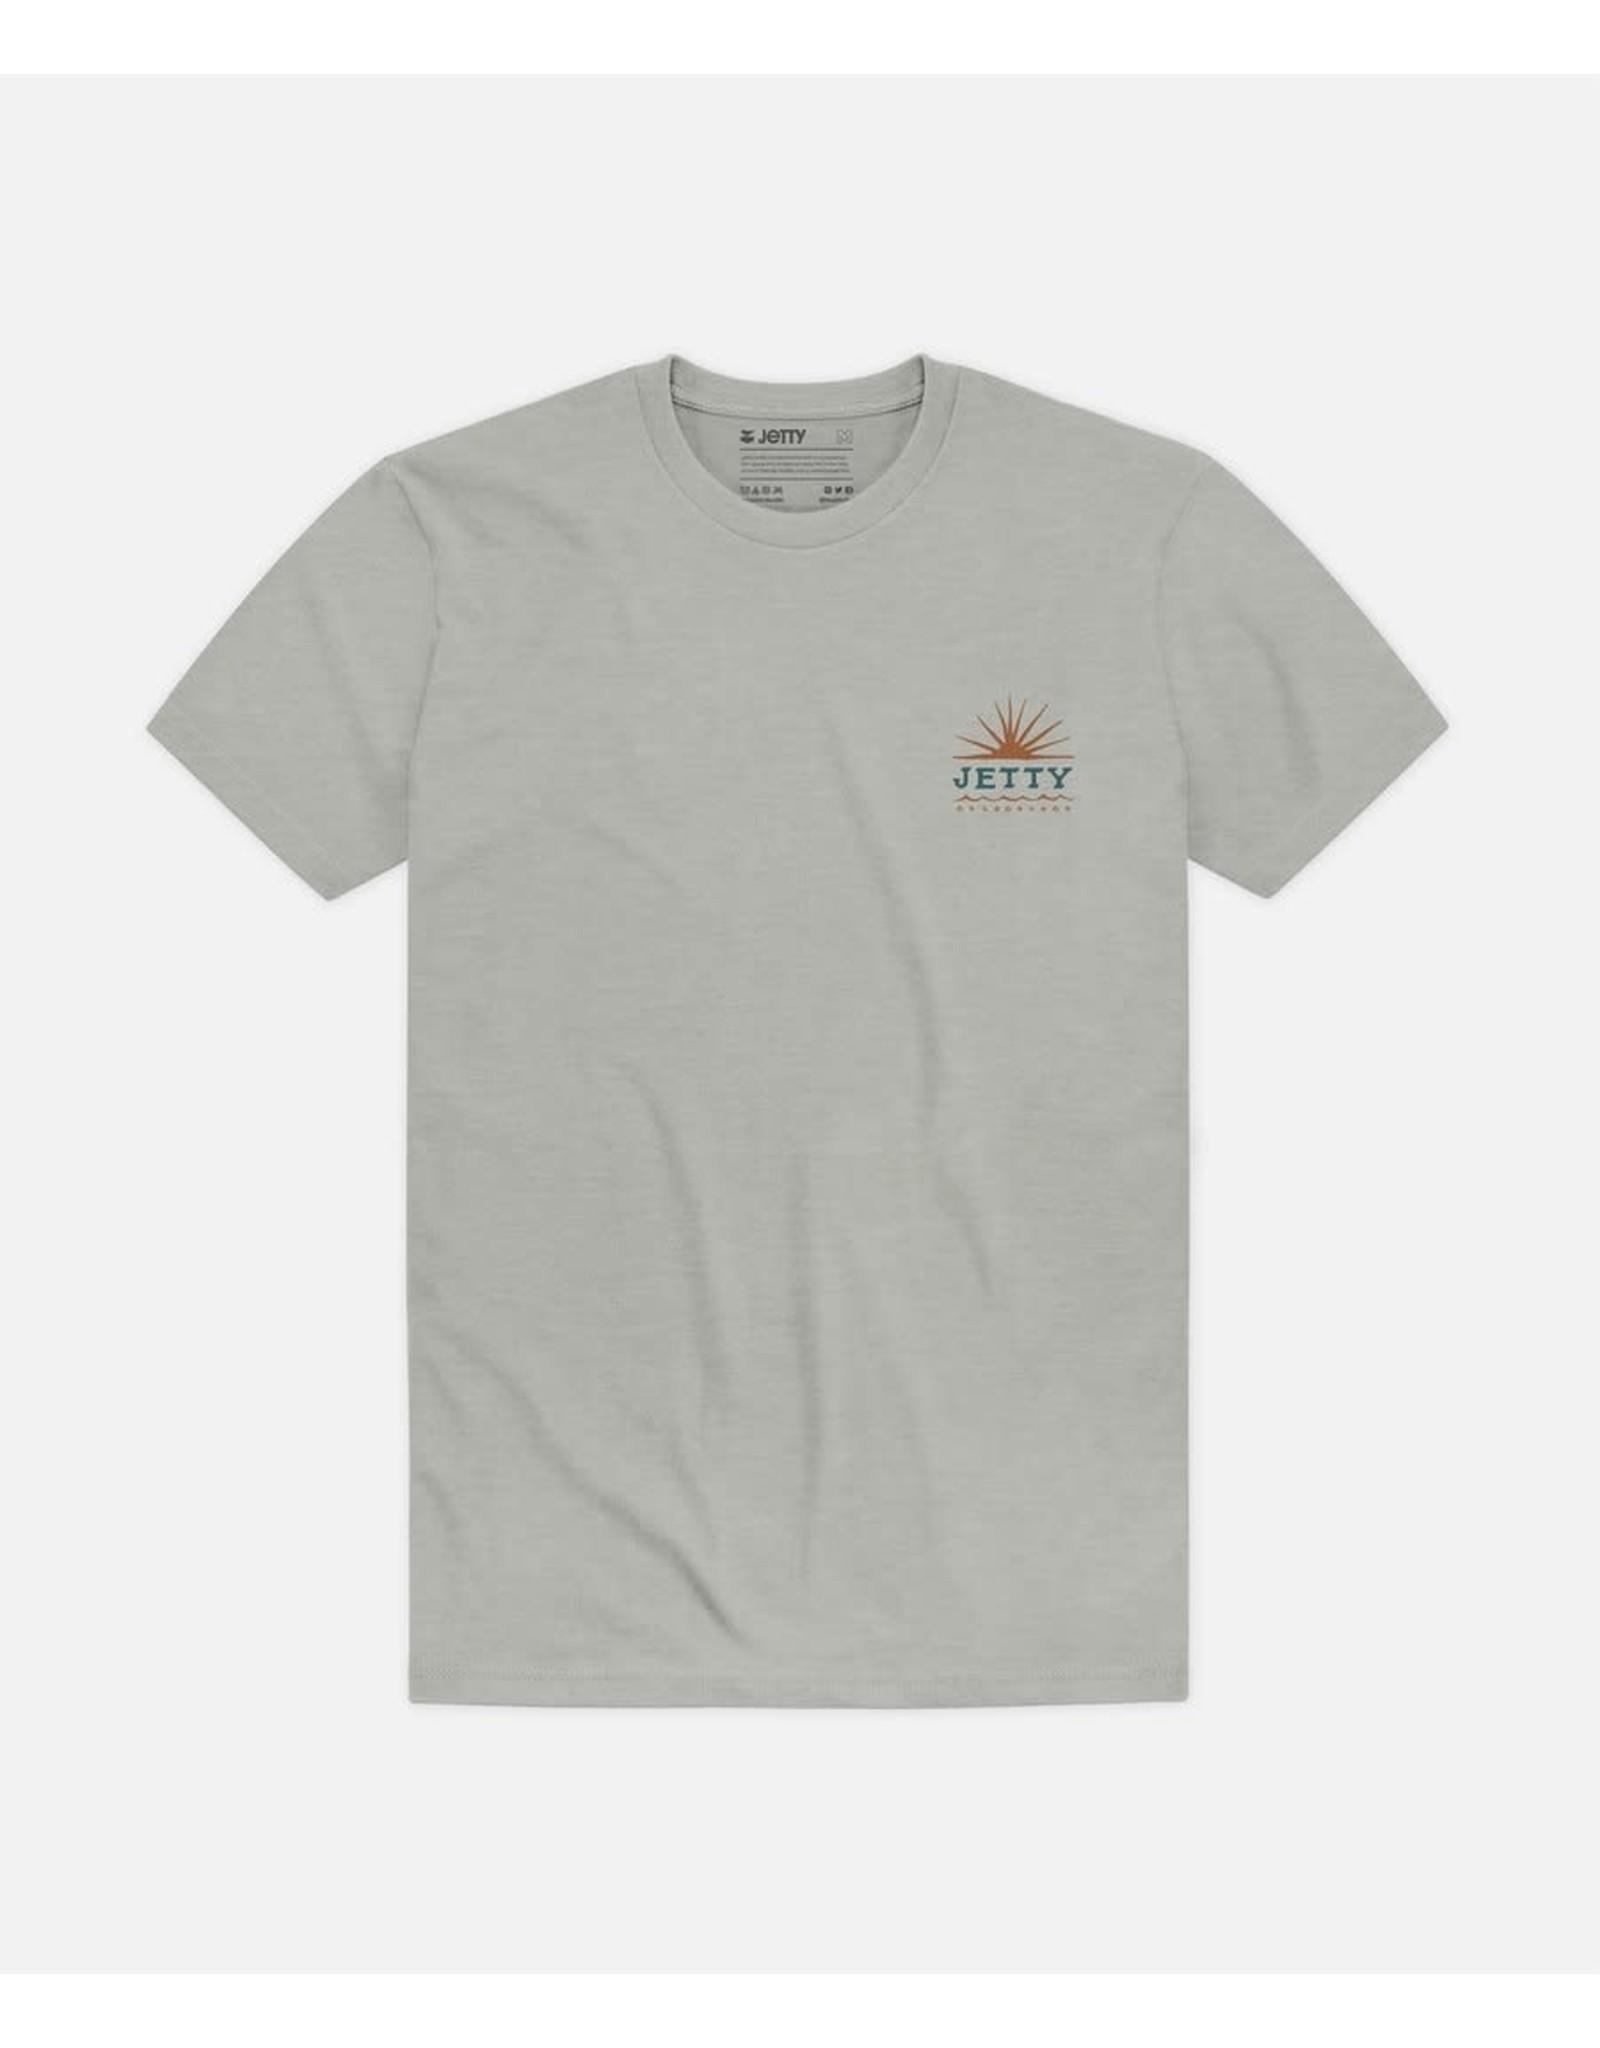 Jetty Scorpion T-Shirt STN